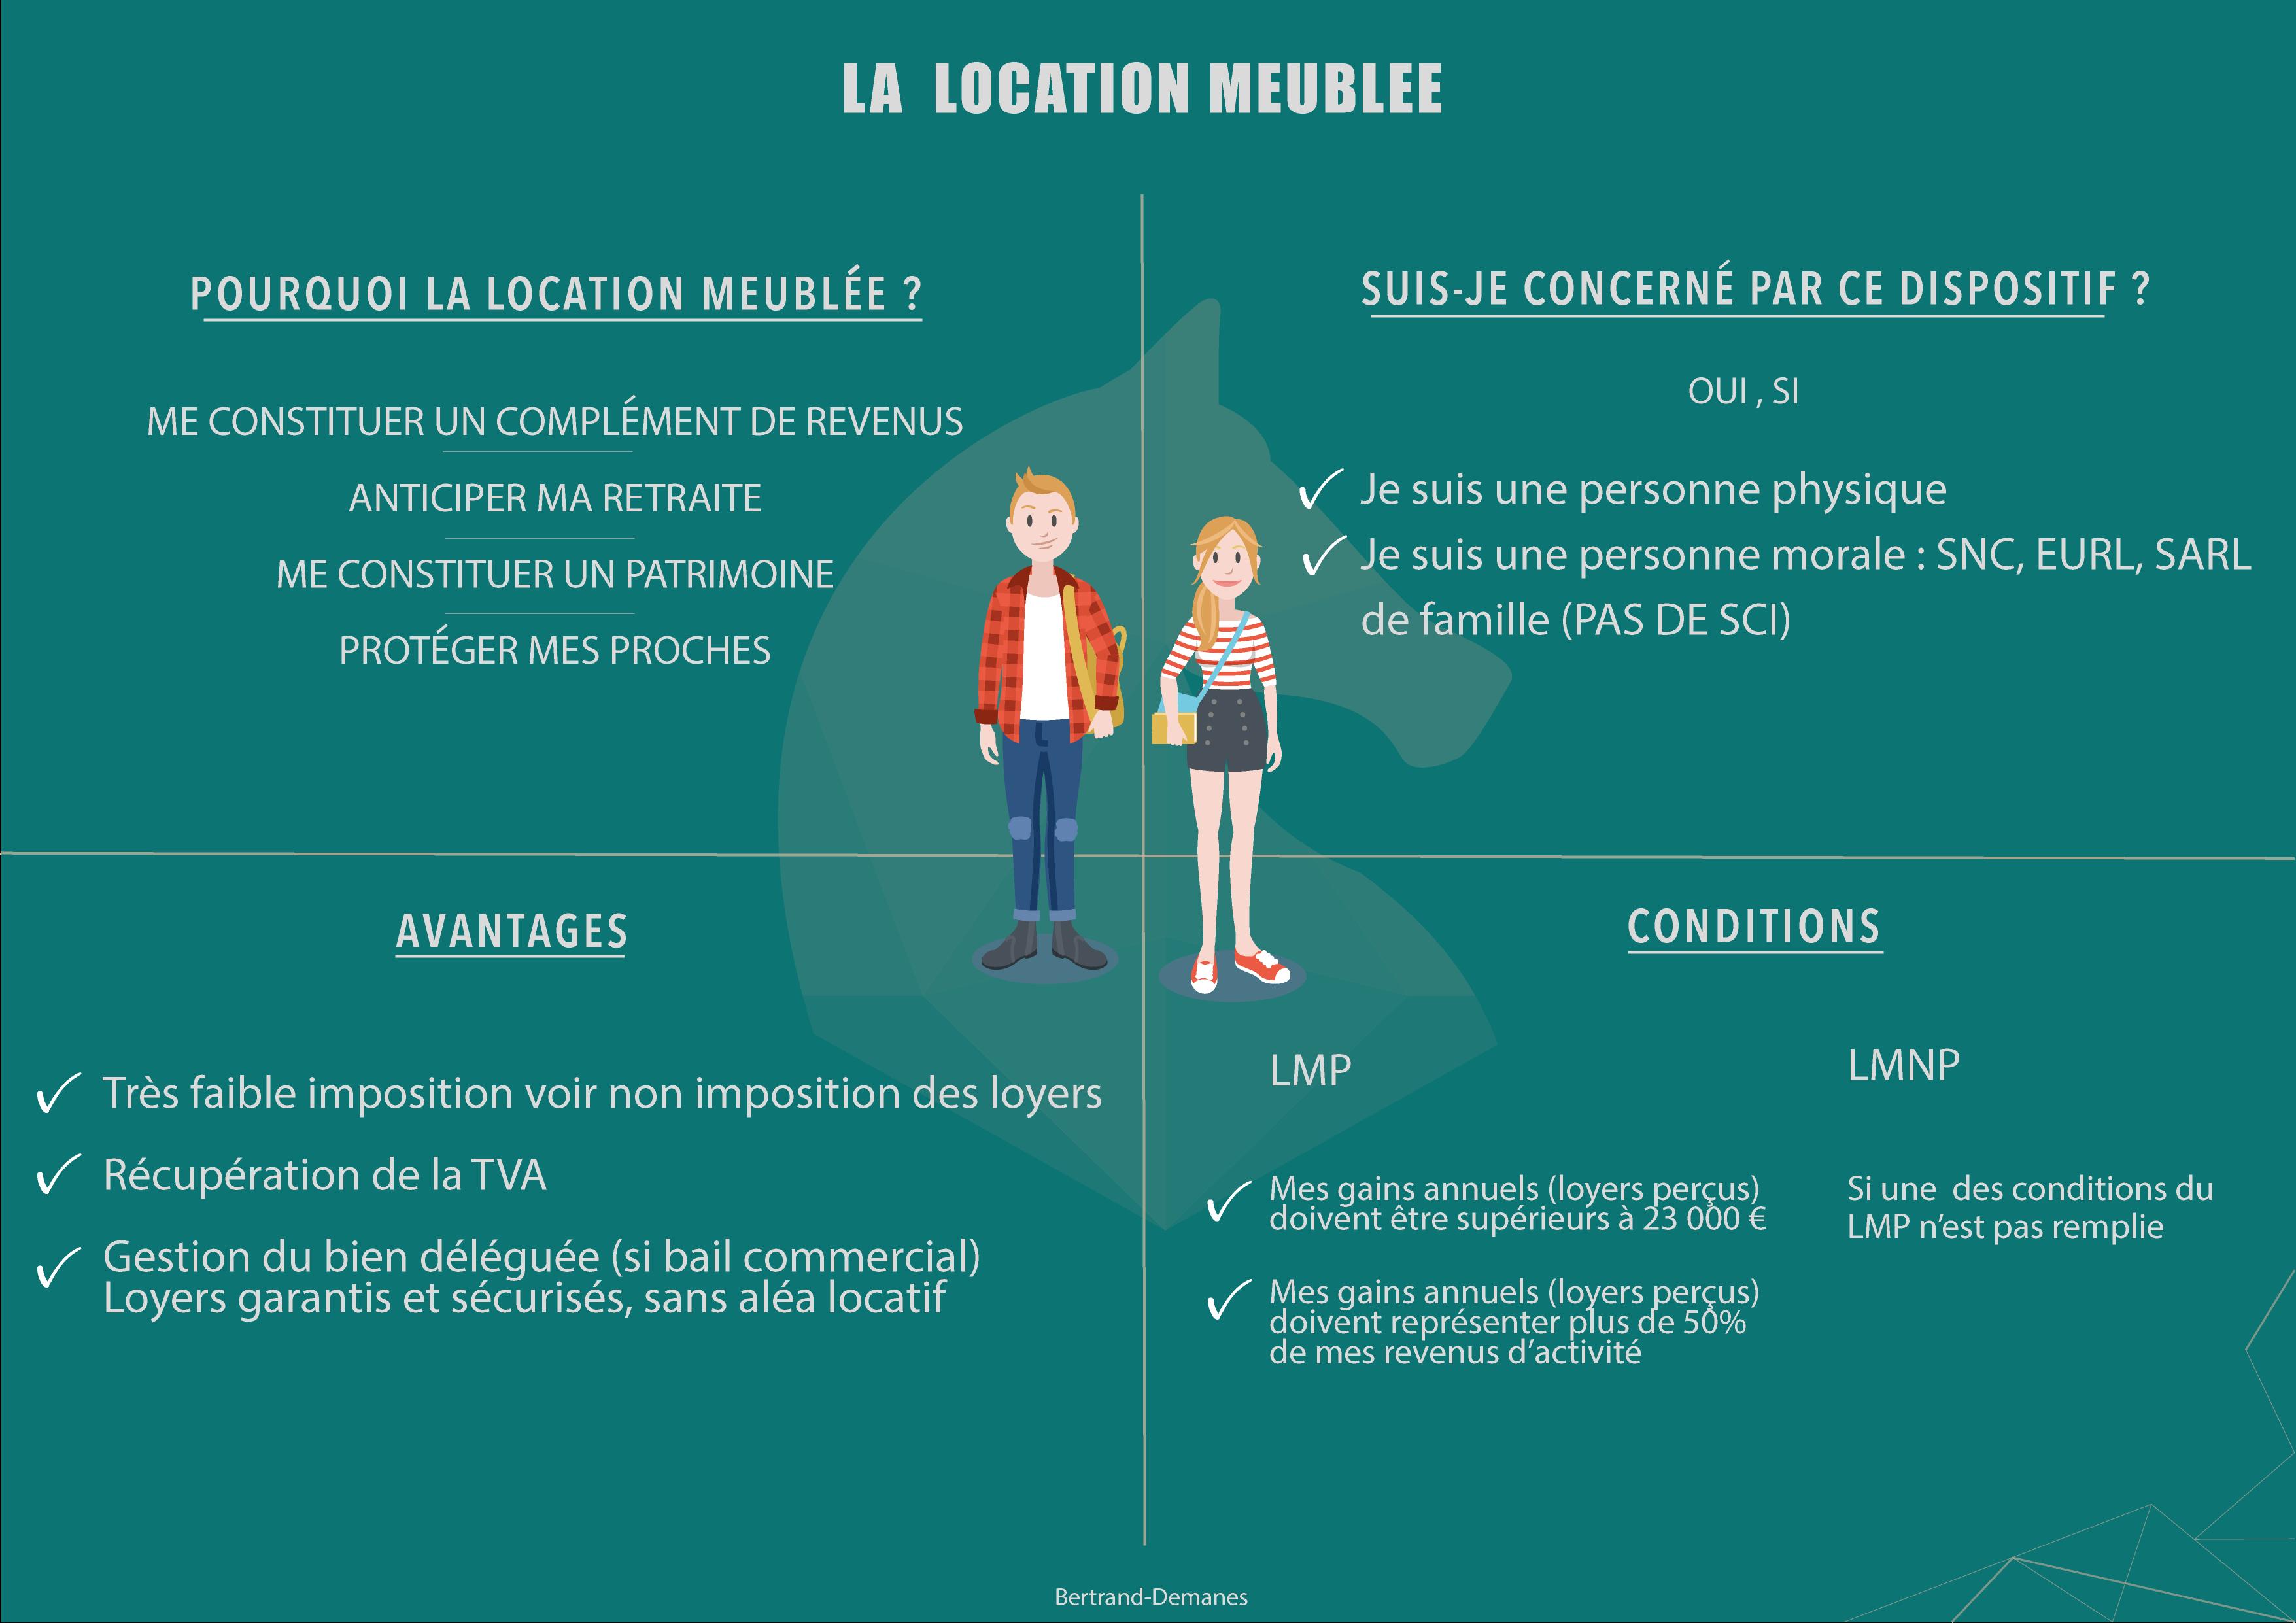 infographie-location-meublee-rennes-bertrand-demanes